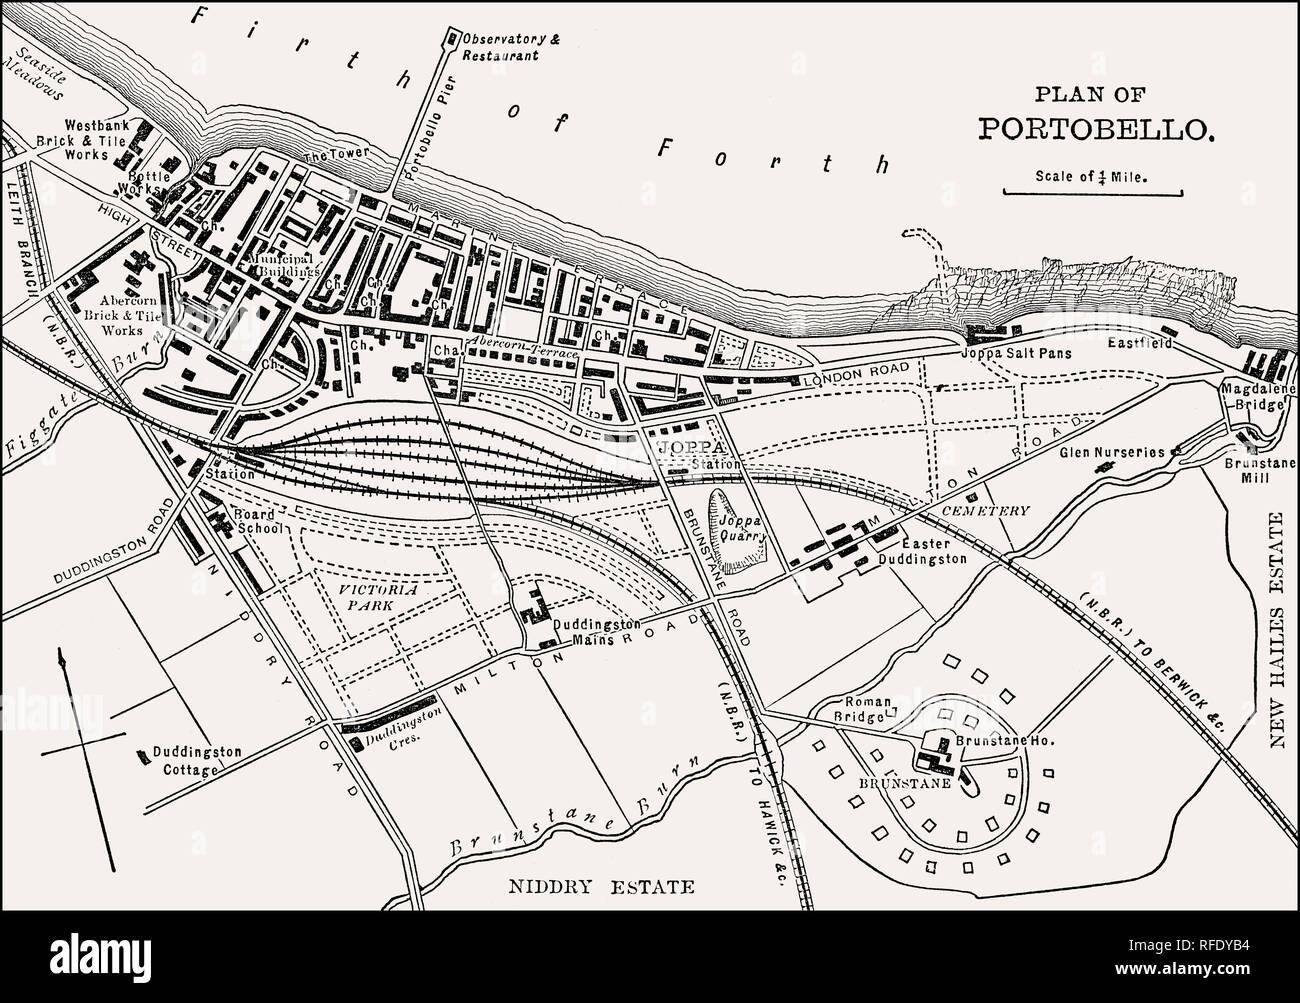 Plan of Portobello, Edinburgh, Scotland, 19th century - Stock Image